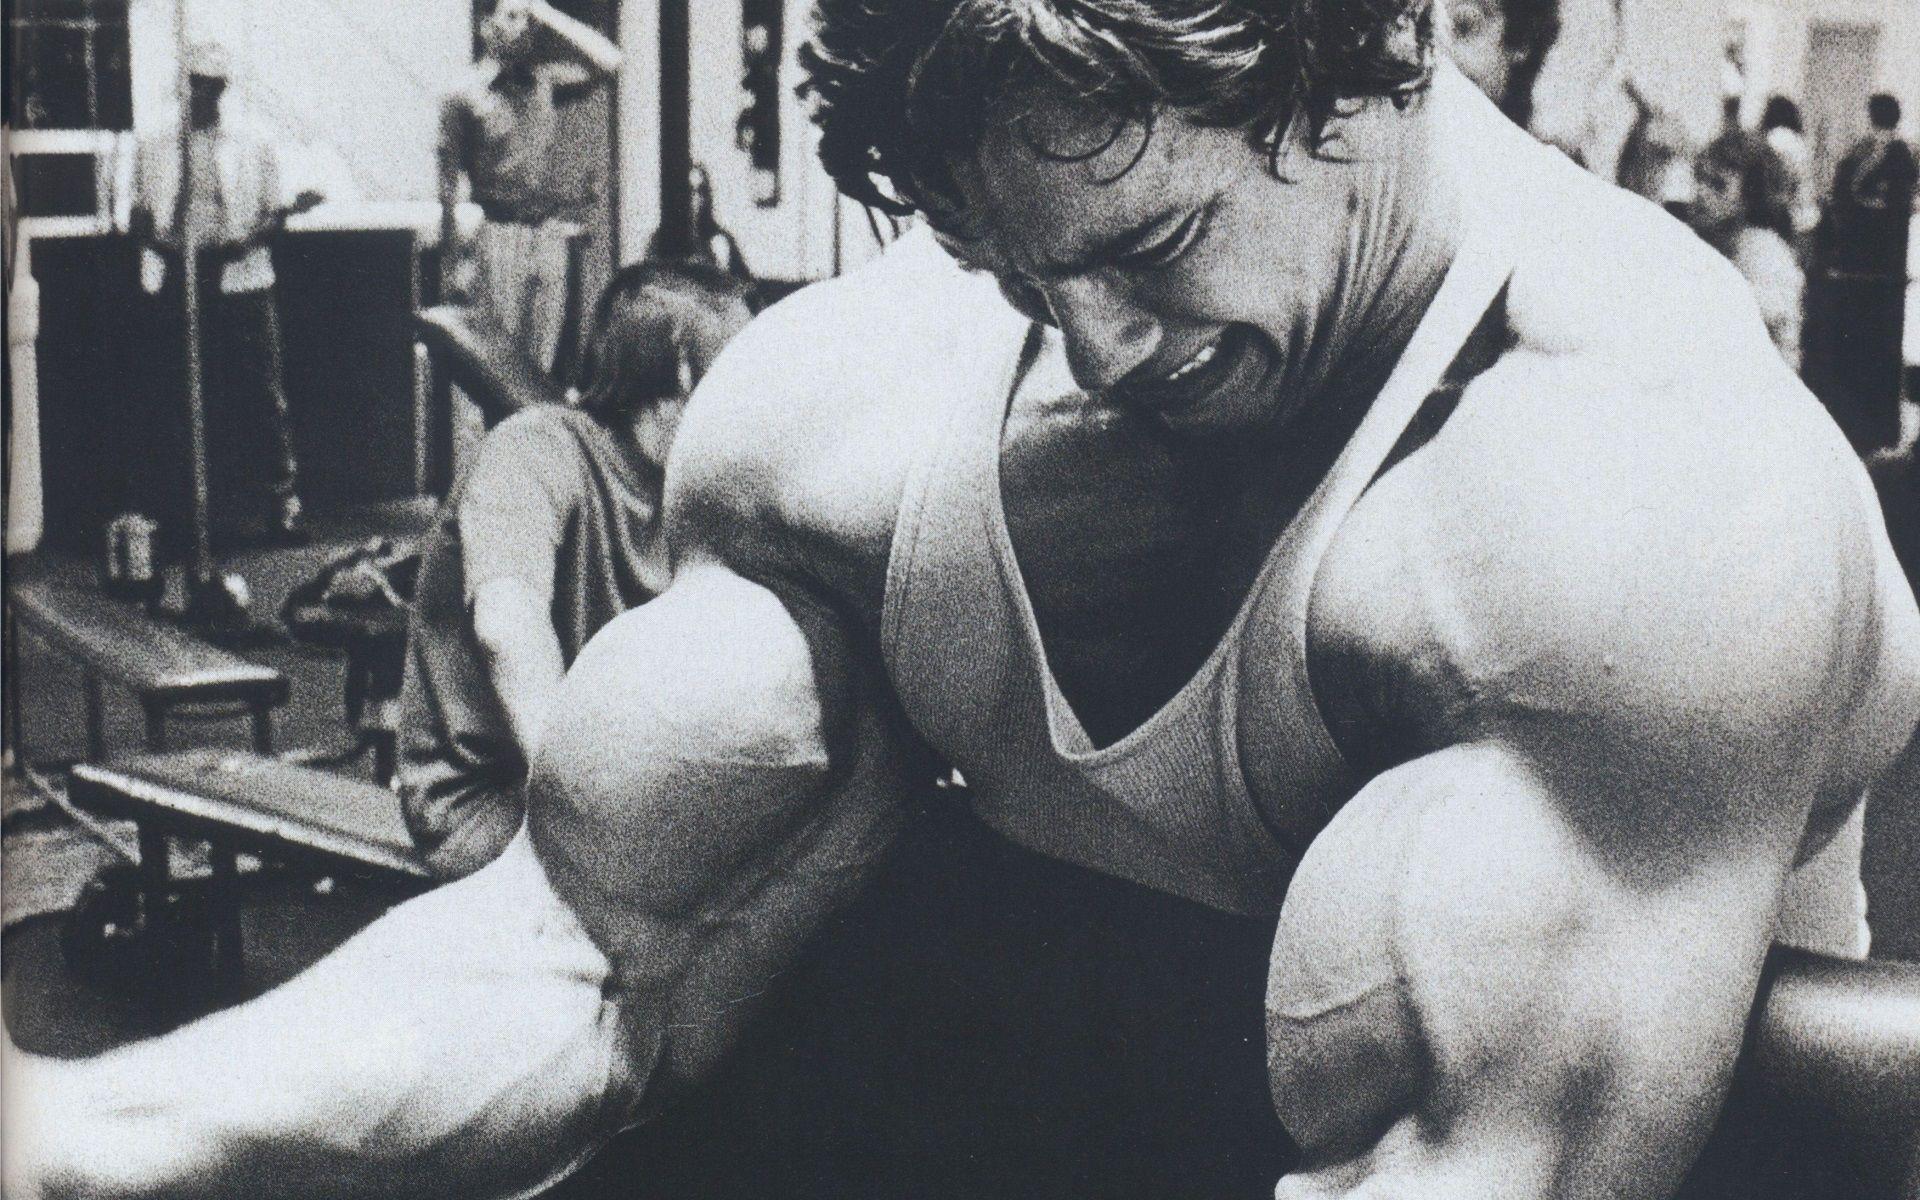 1920x1200 Arnold Schwarzenegger Interesting Wallpaper Hd With